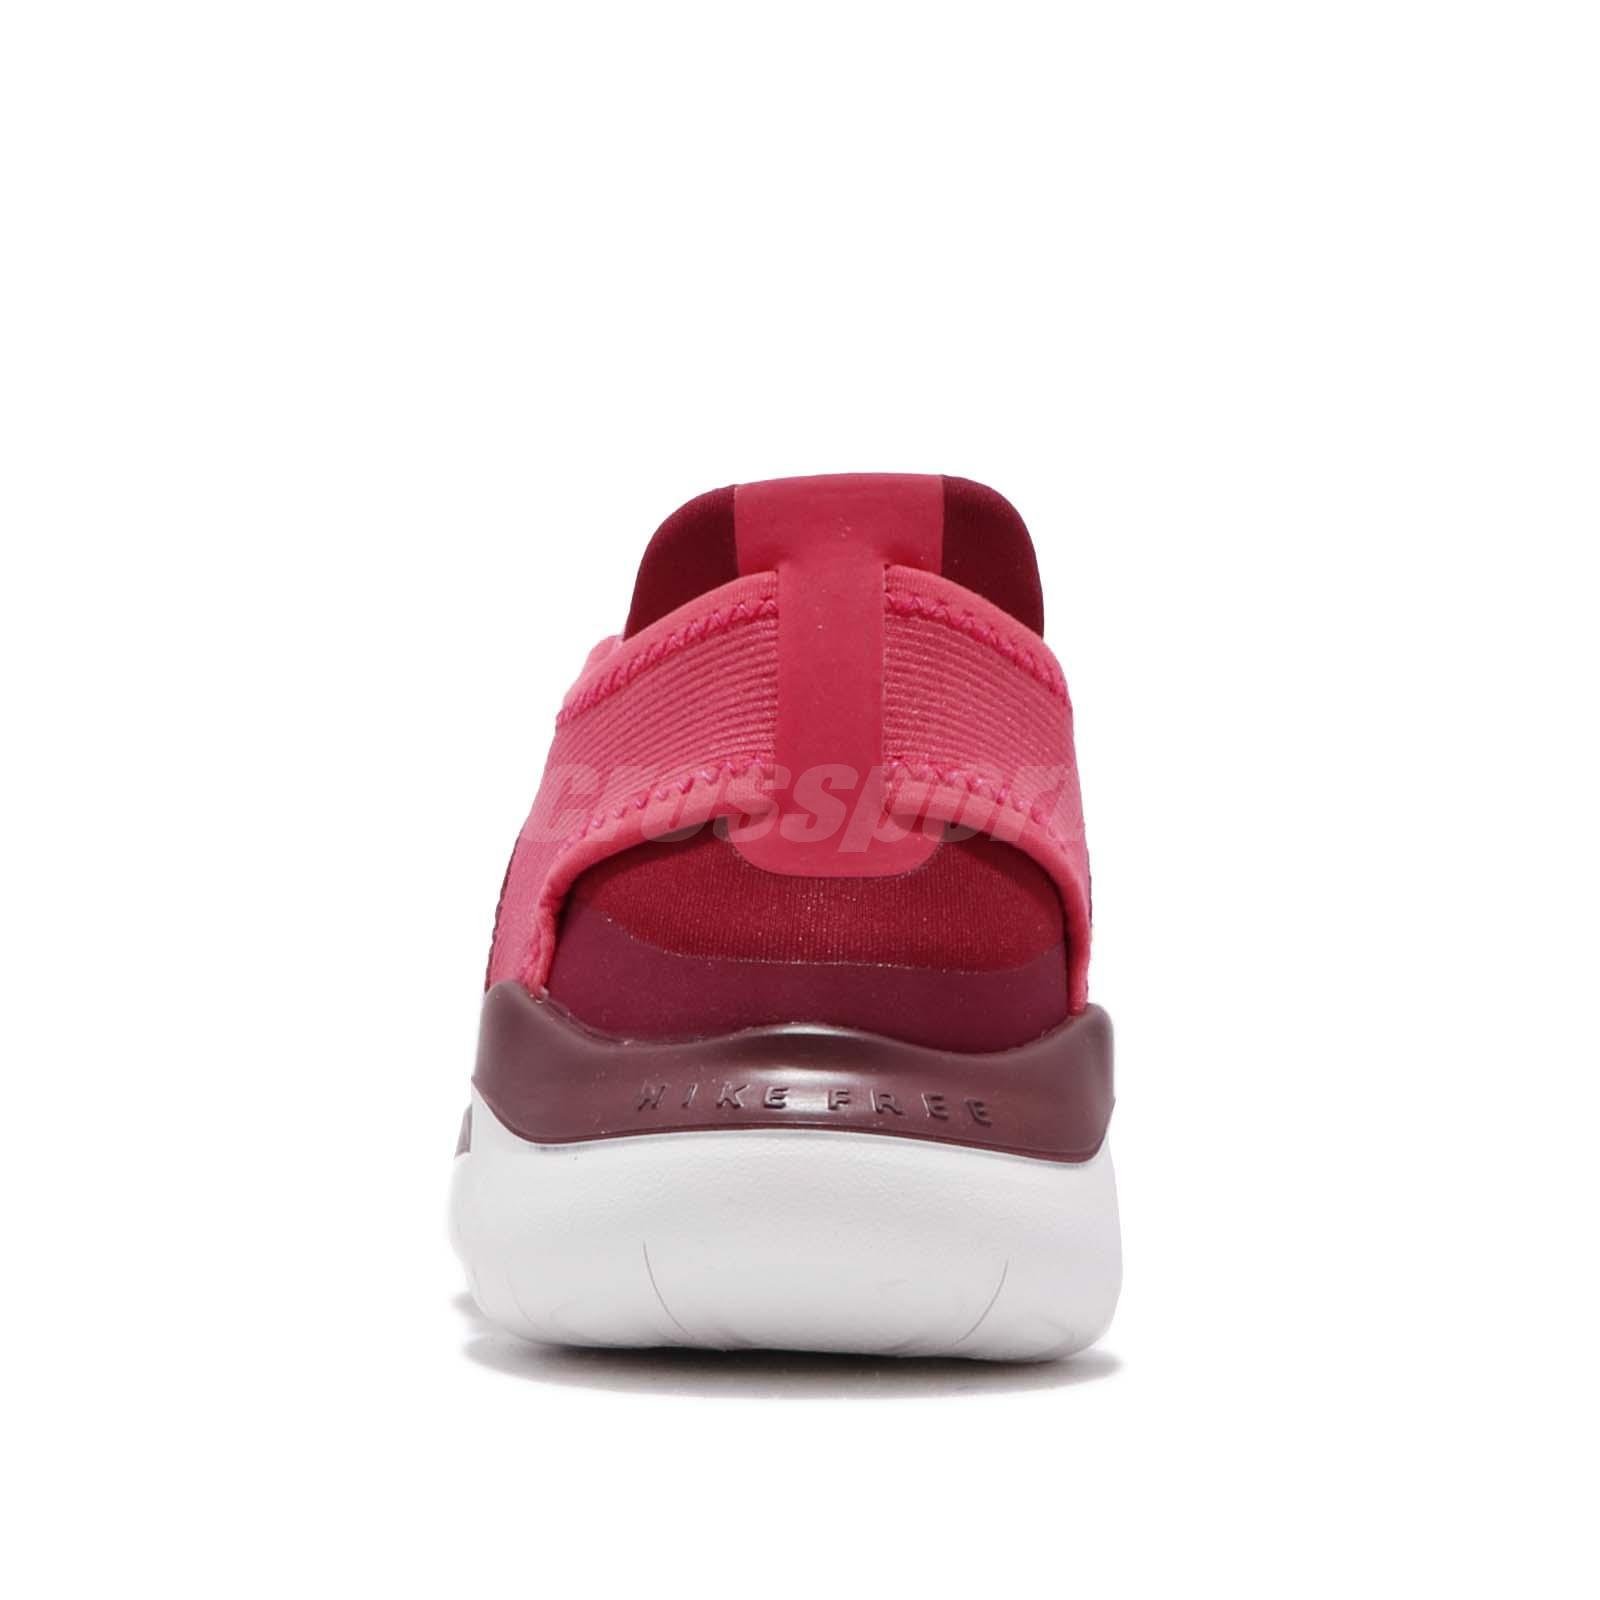 61ce14ebd3edf Nike Wmns Free RN 18 Wild Velvet Red Crush Women Running Shoe ...